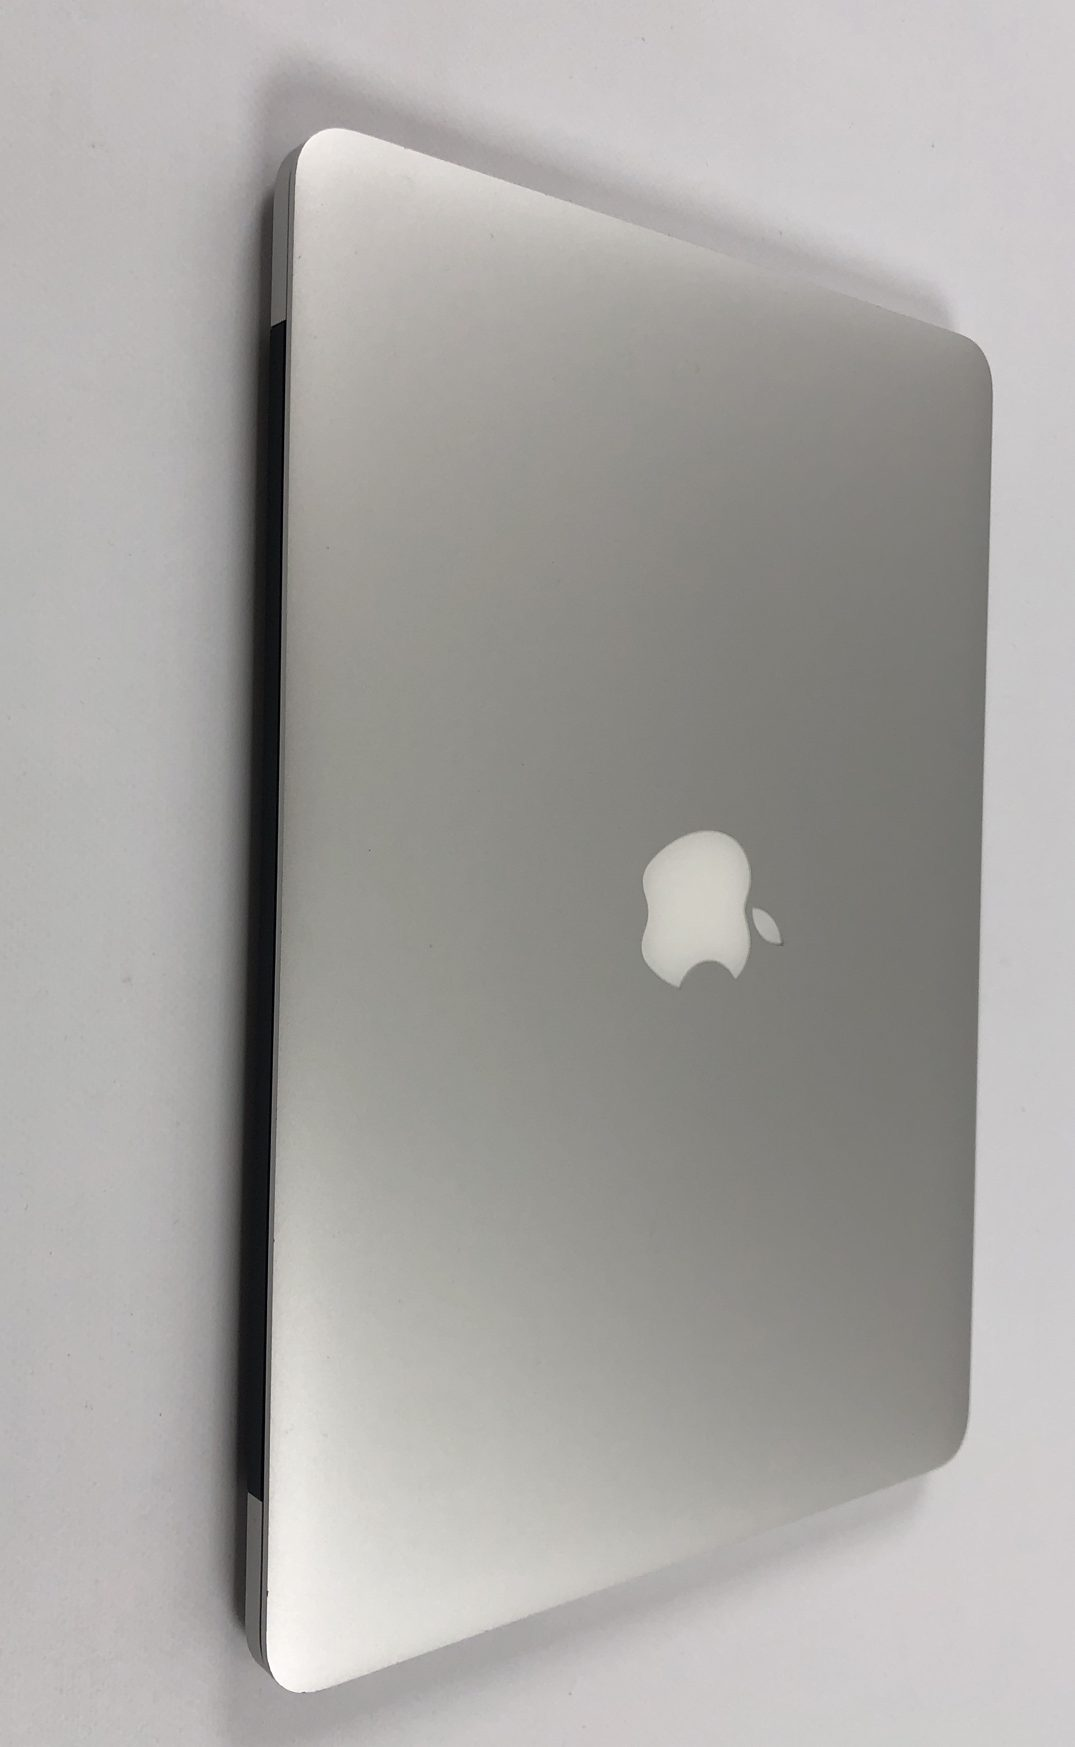 "MacBook Pro Retina 13"" Mid 2014 (Intel Core i7 3.0 GHz 16 GB RAM 256 GB SSD), Intel Core i7 3.0 GHz, 16 GB RAM, 256 GB SSD, bild 5"